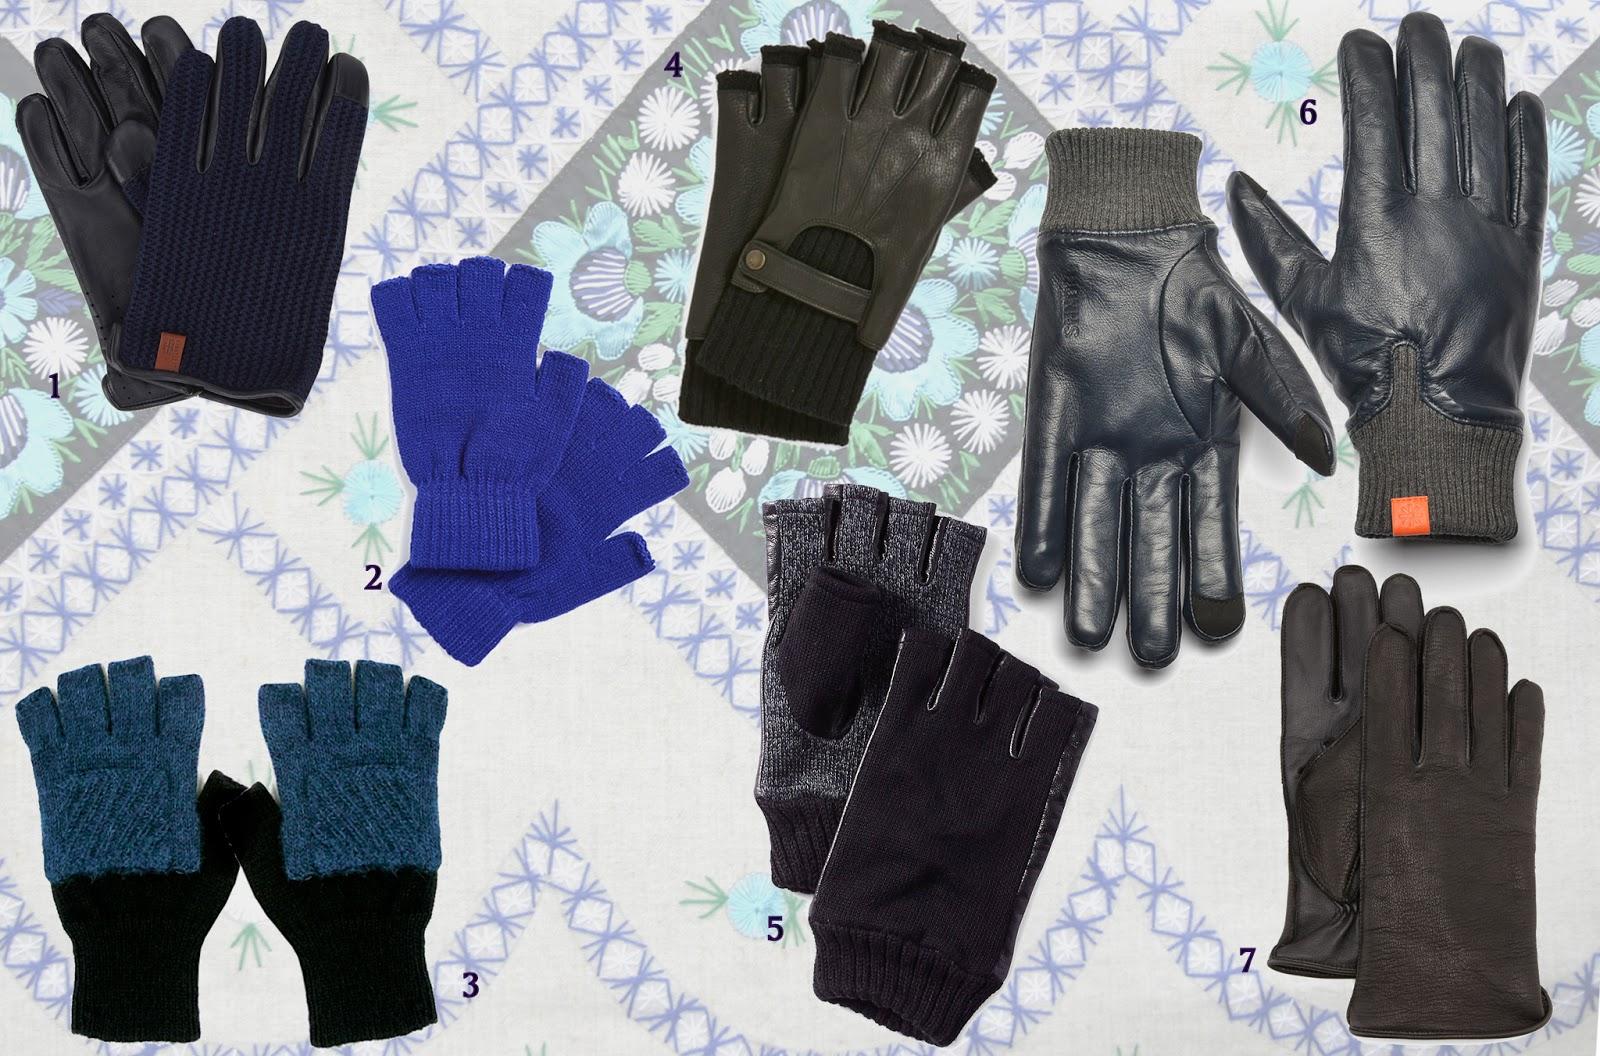 Kid leather driving gloves - Original Penguin Knit And Leather Driving Gloves 80